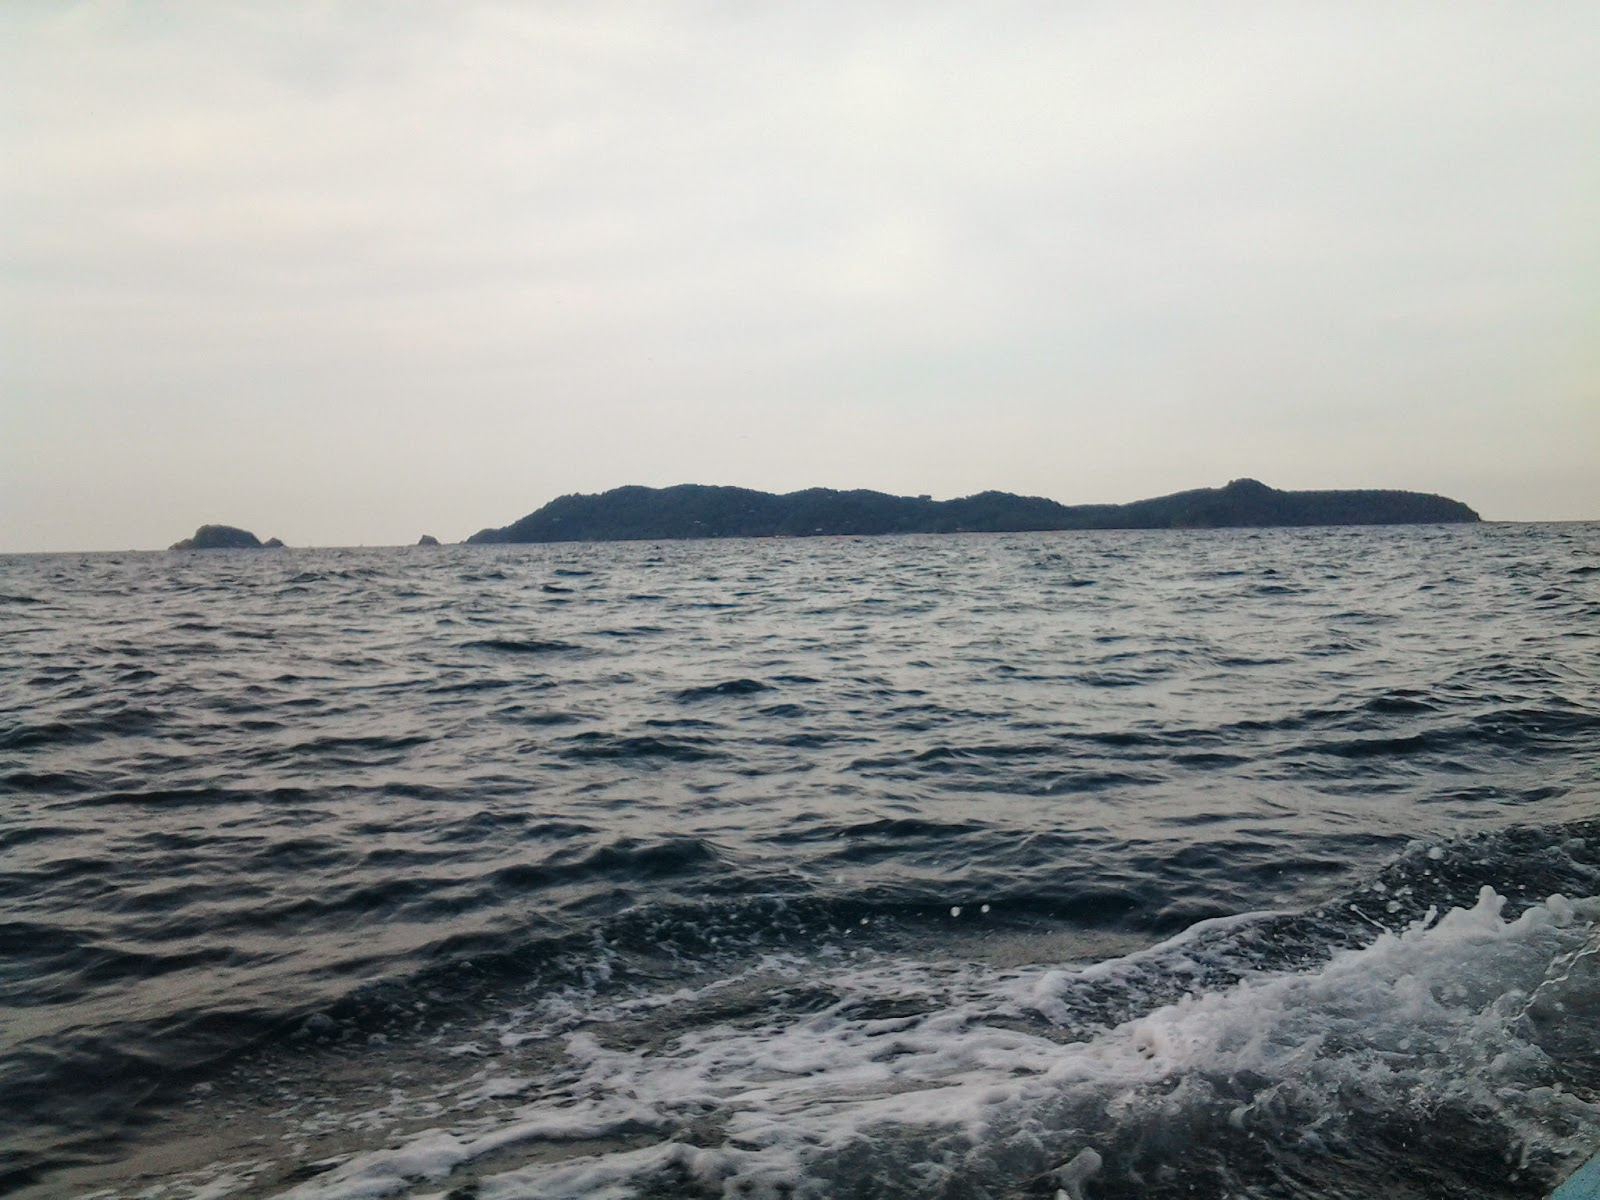 fishing journal mencandat sotong 2014 marang terengganu